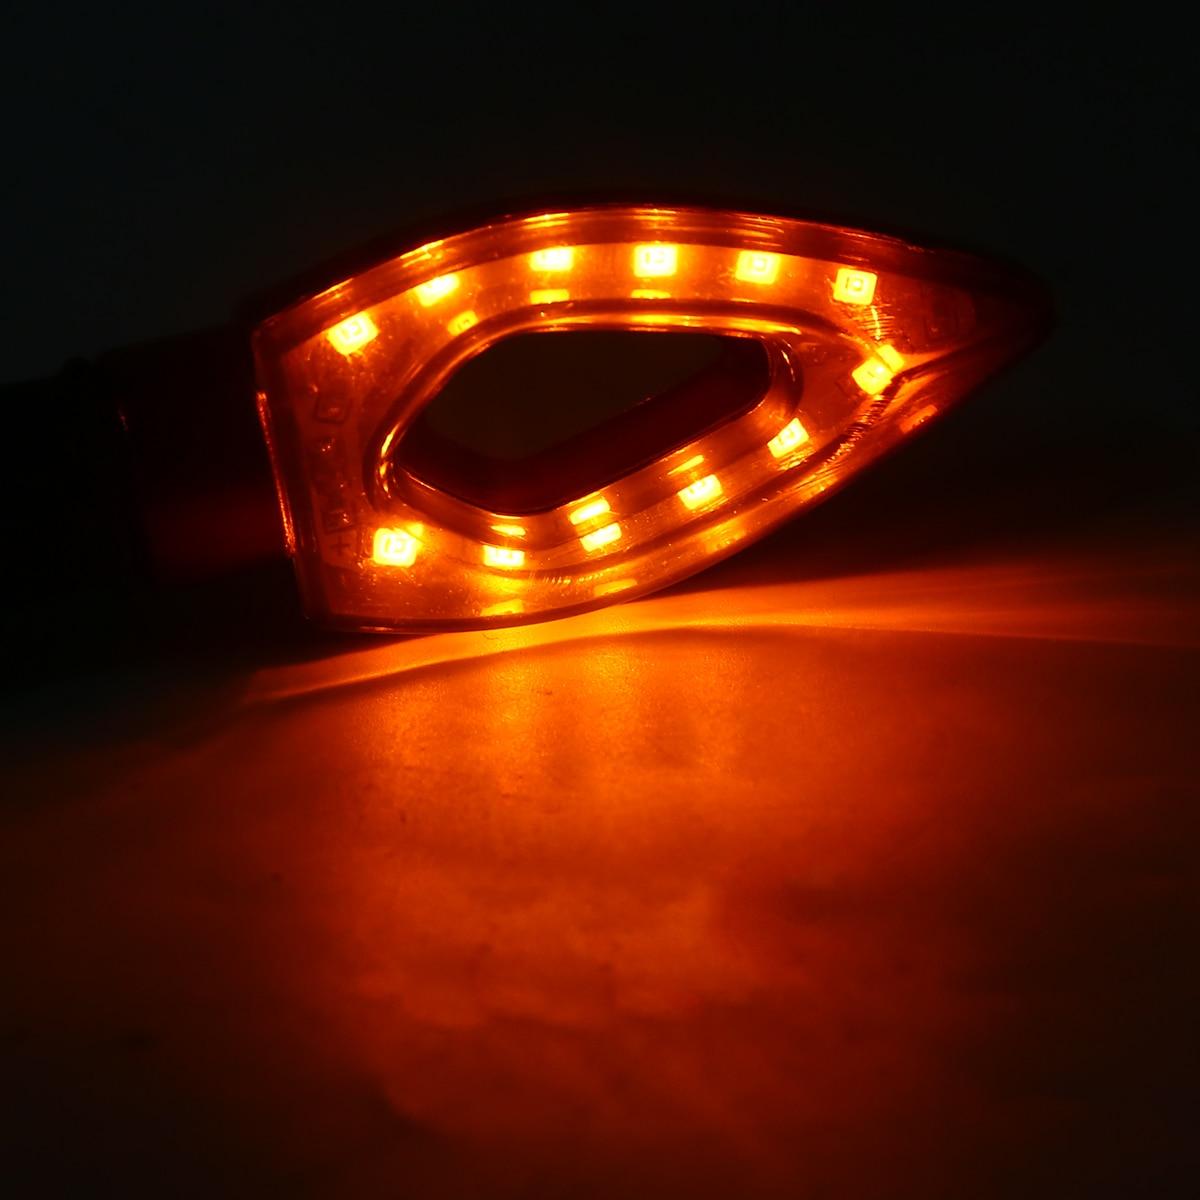 4pcs 12V Universal Moto LED Turn Signal Light Indicators Flashers Amber Blinker Light Motorcycle Accessories